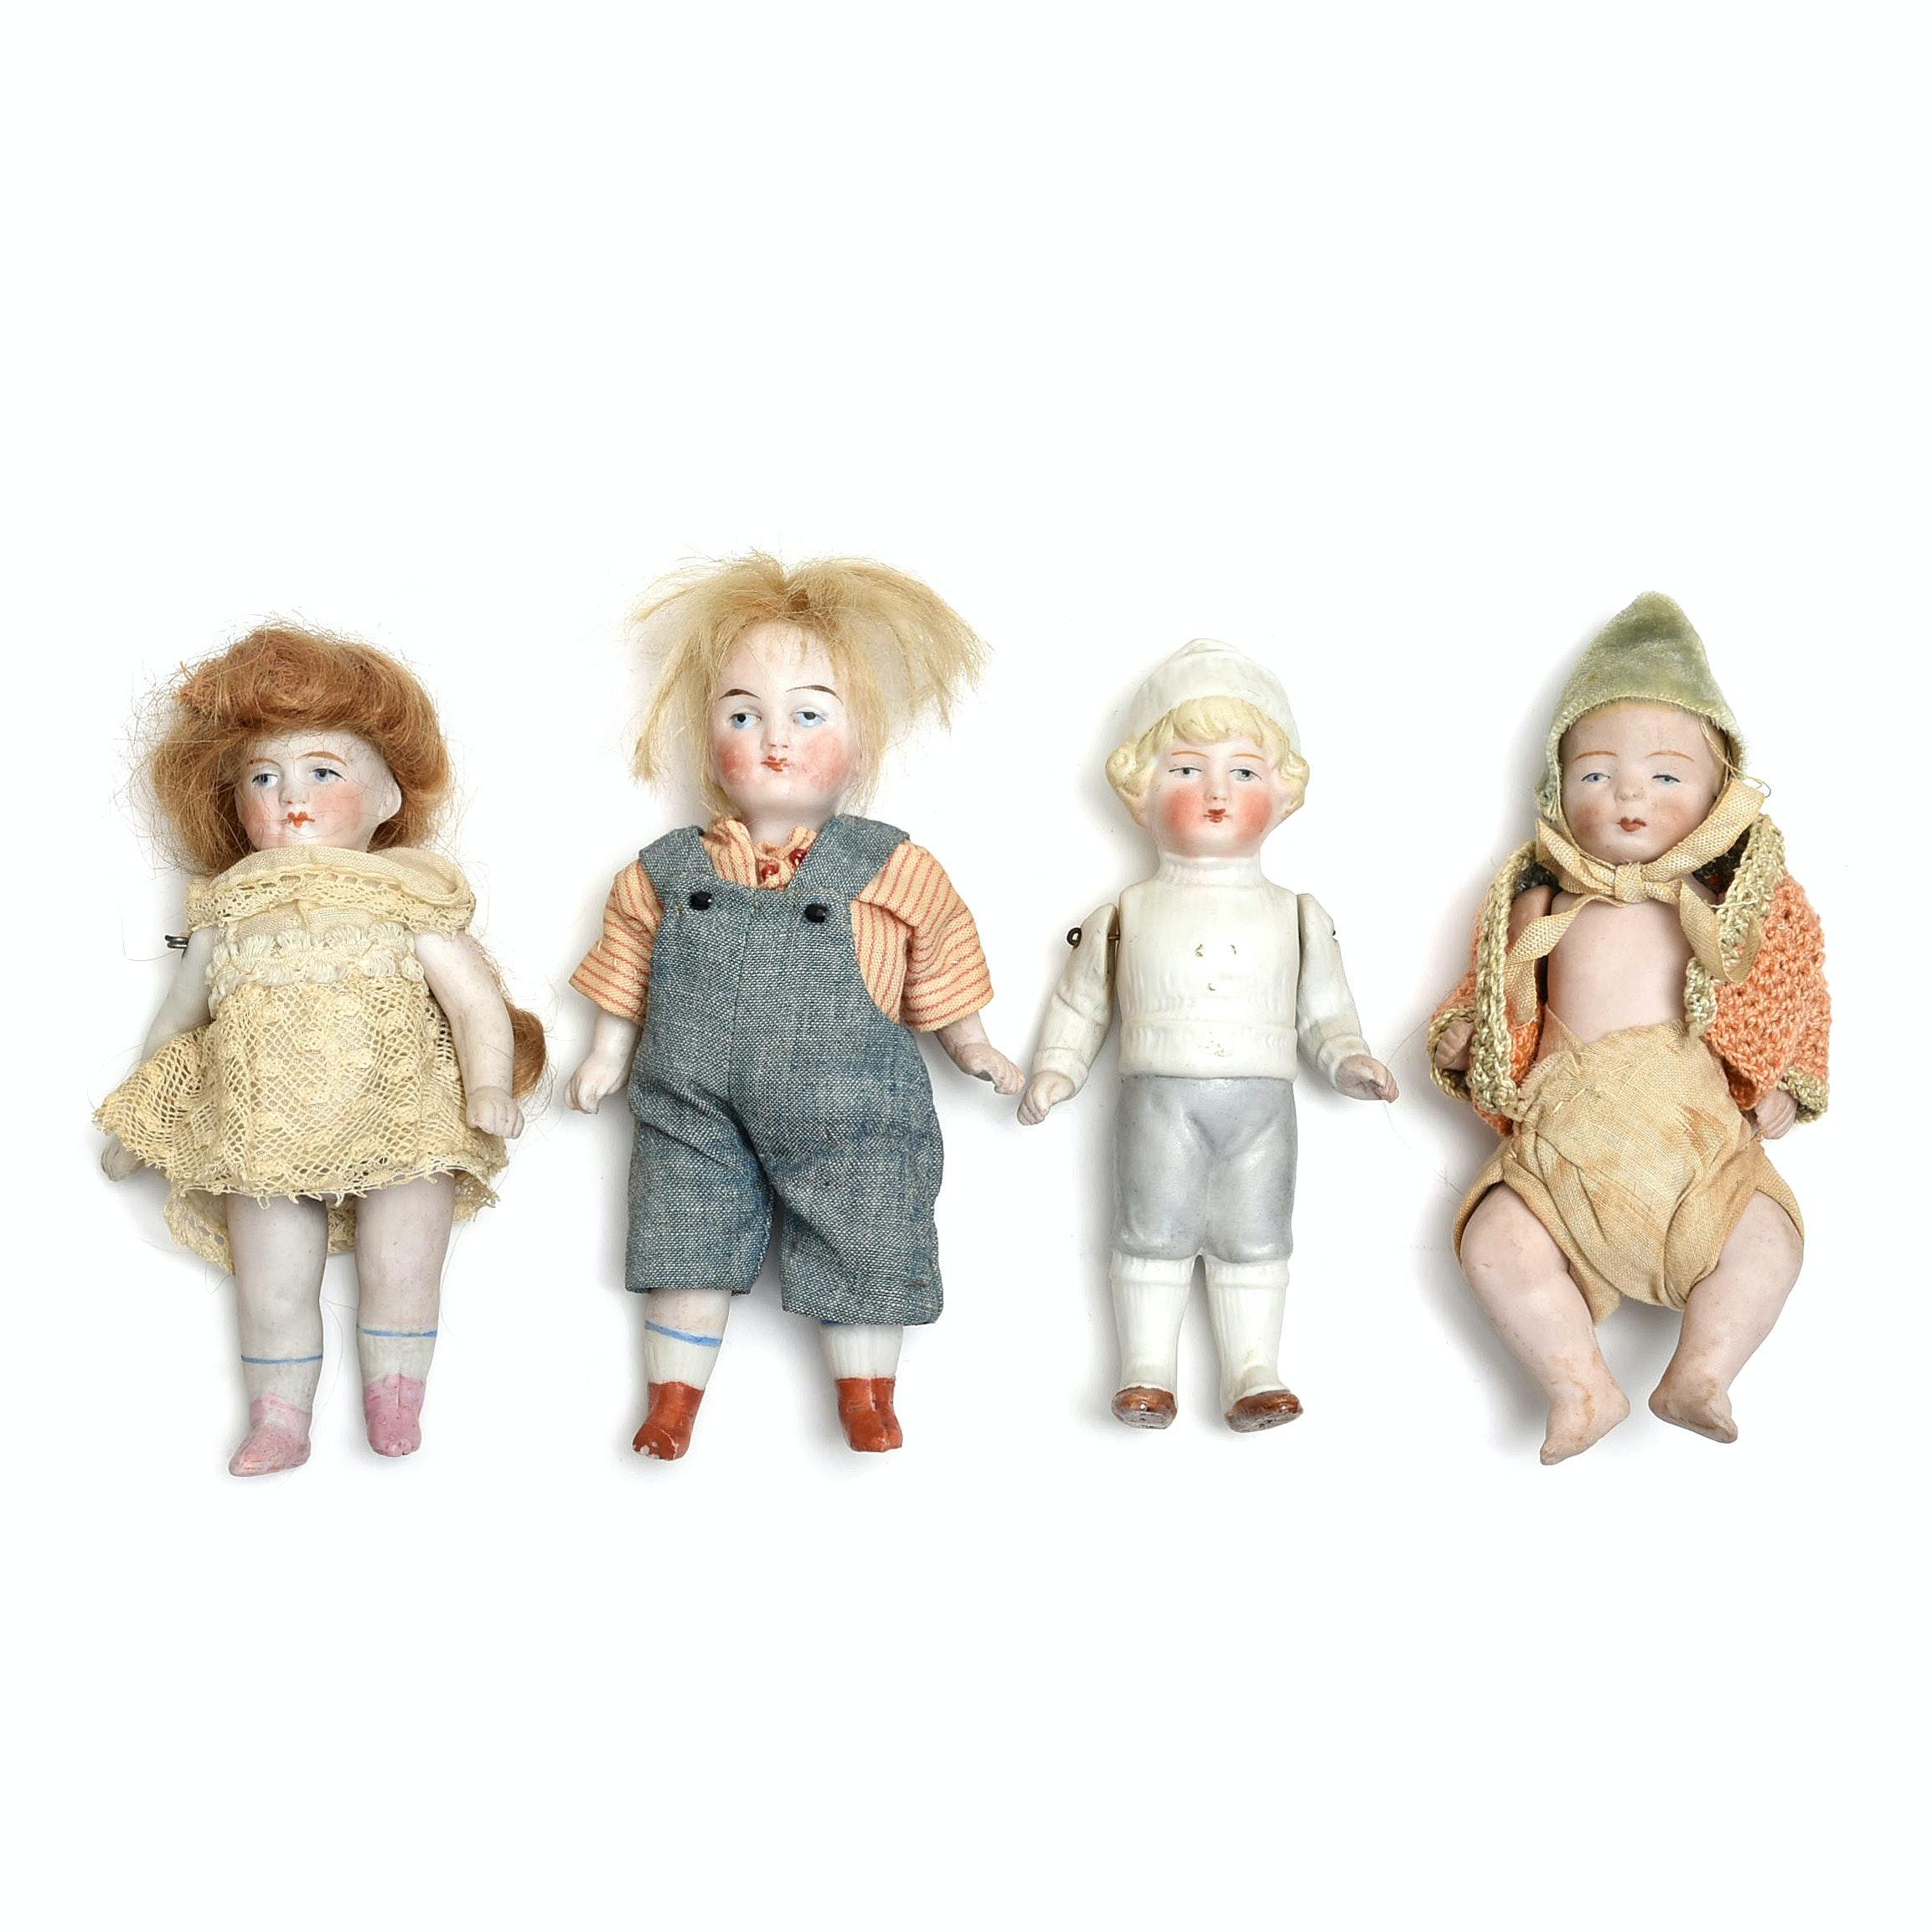 Four Small Vintage Bisque Dolls